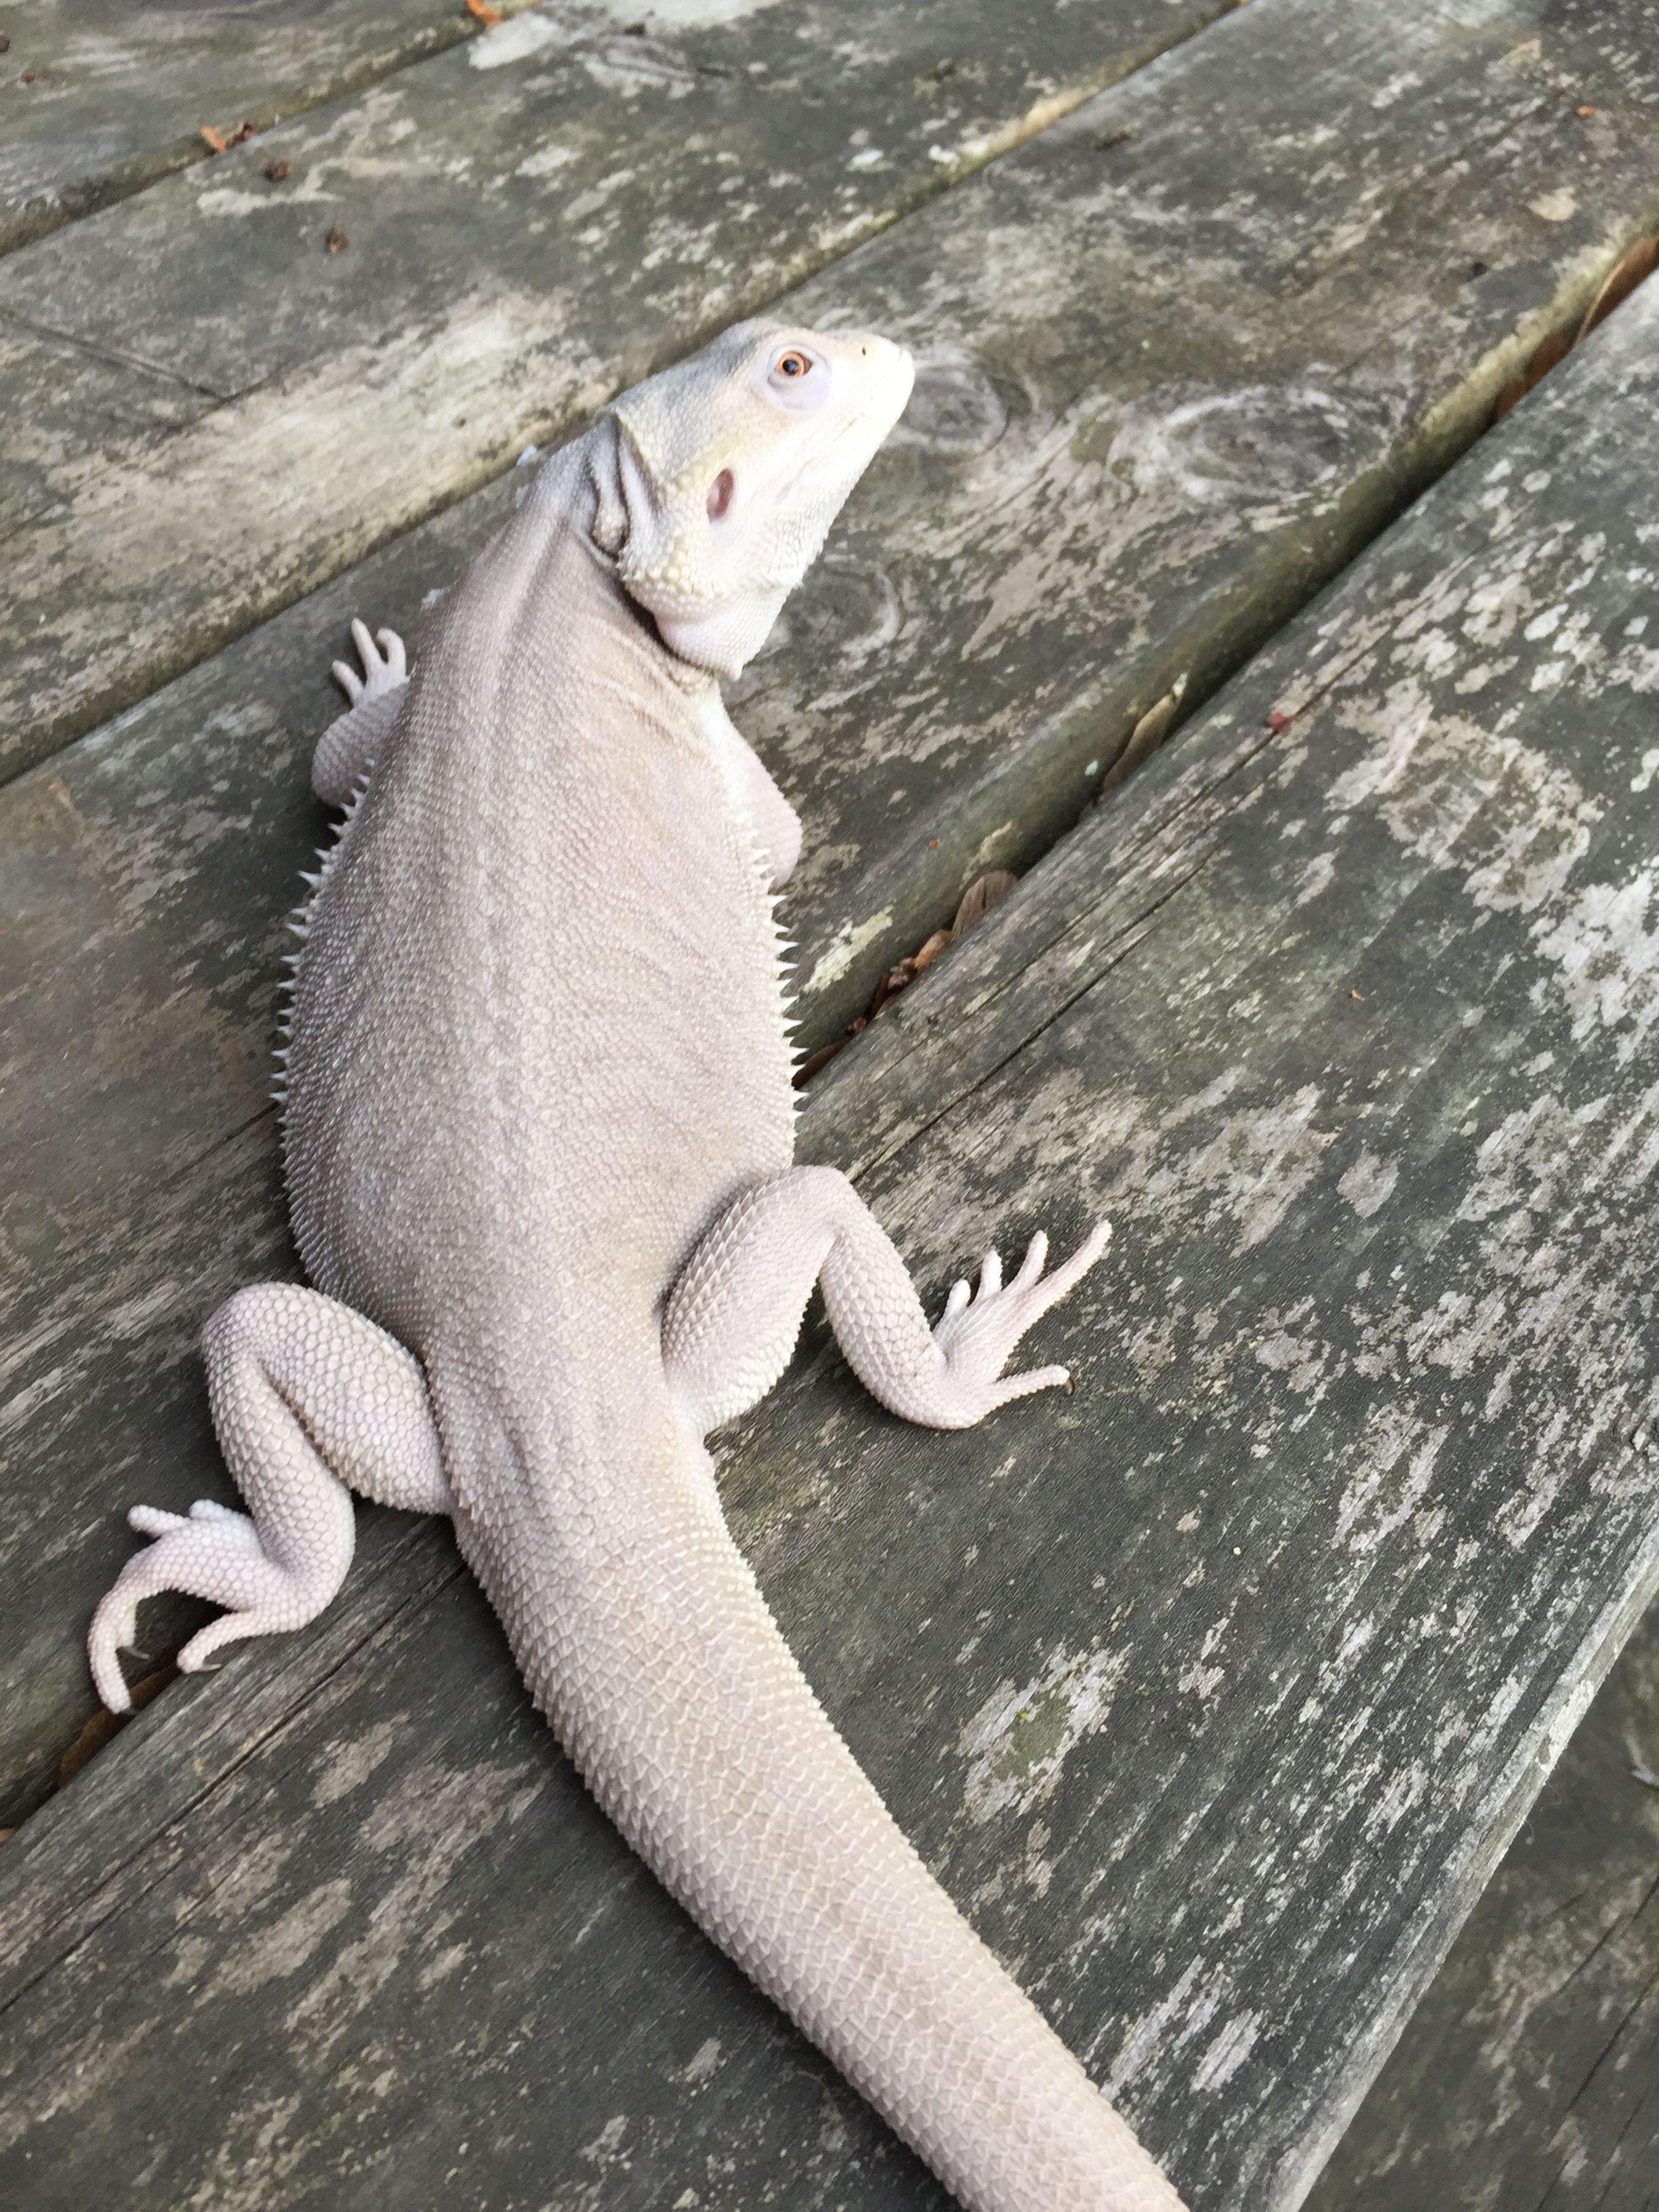 Komodo Dragon Videos Discovery Channel